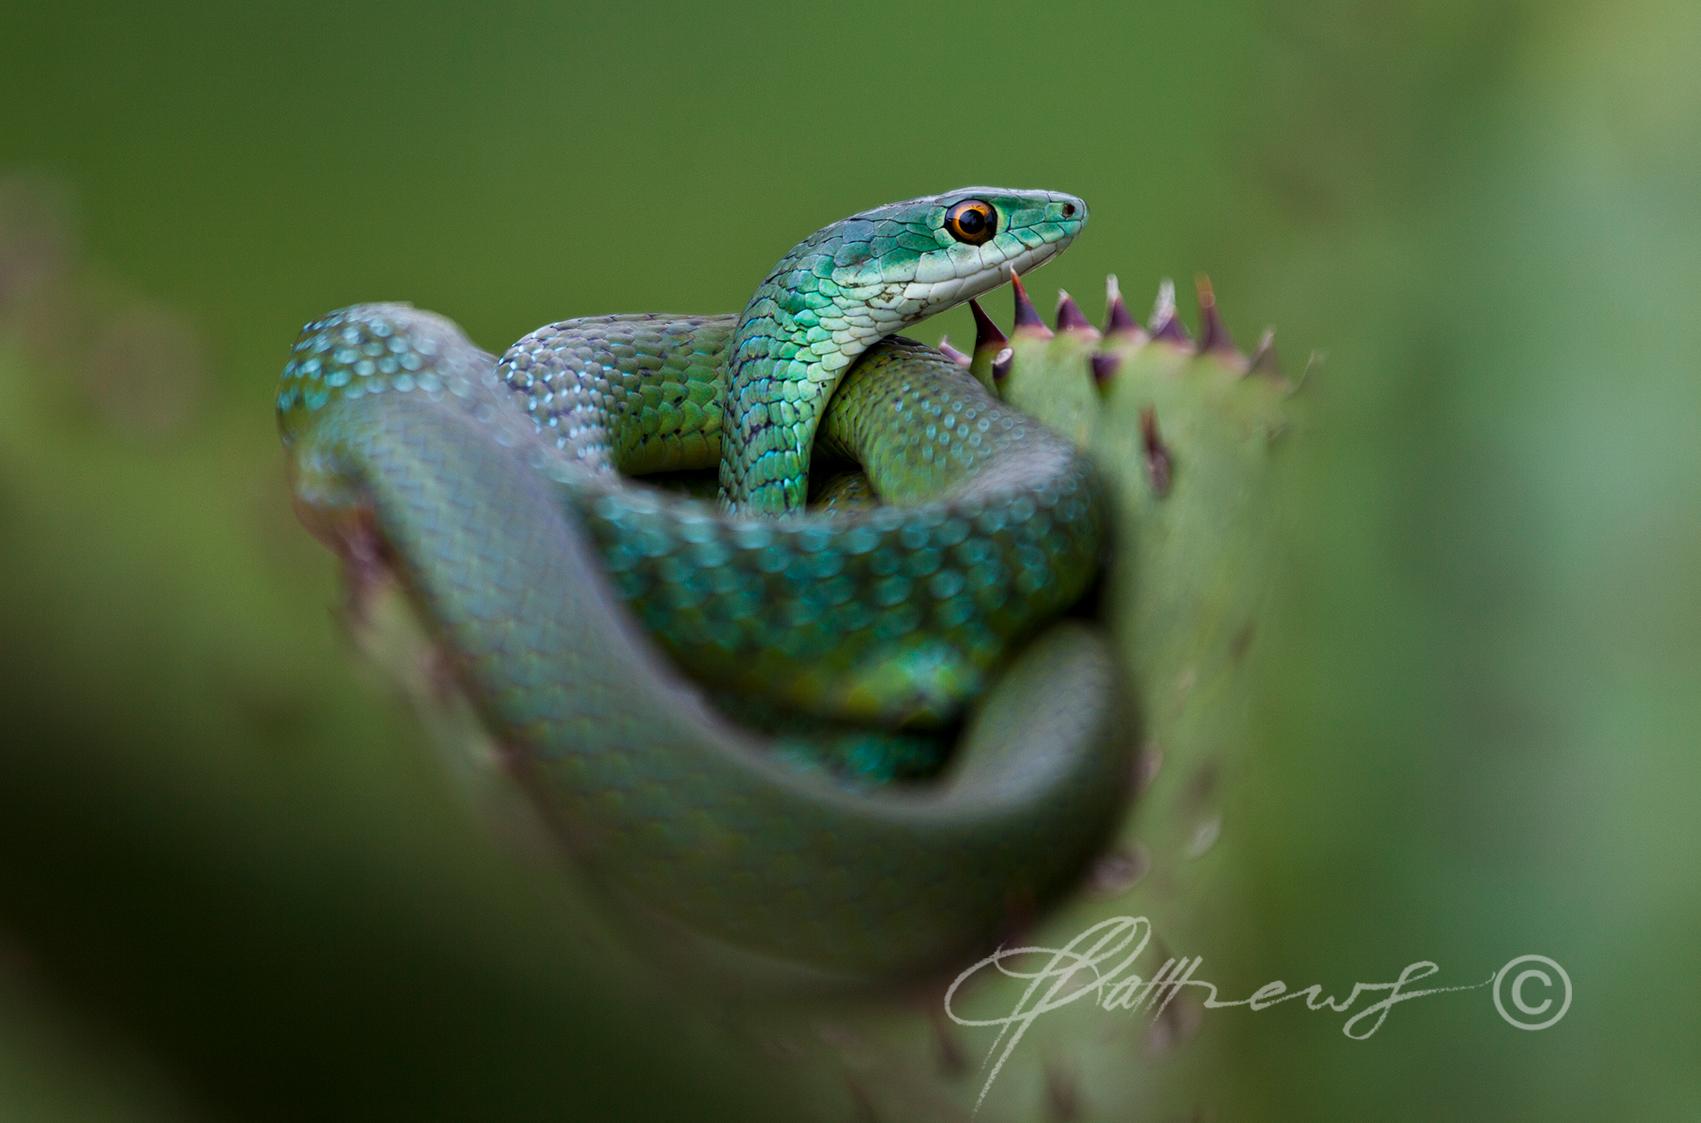 Bush-snake